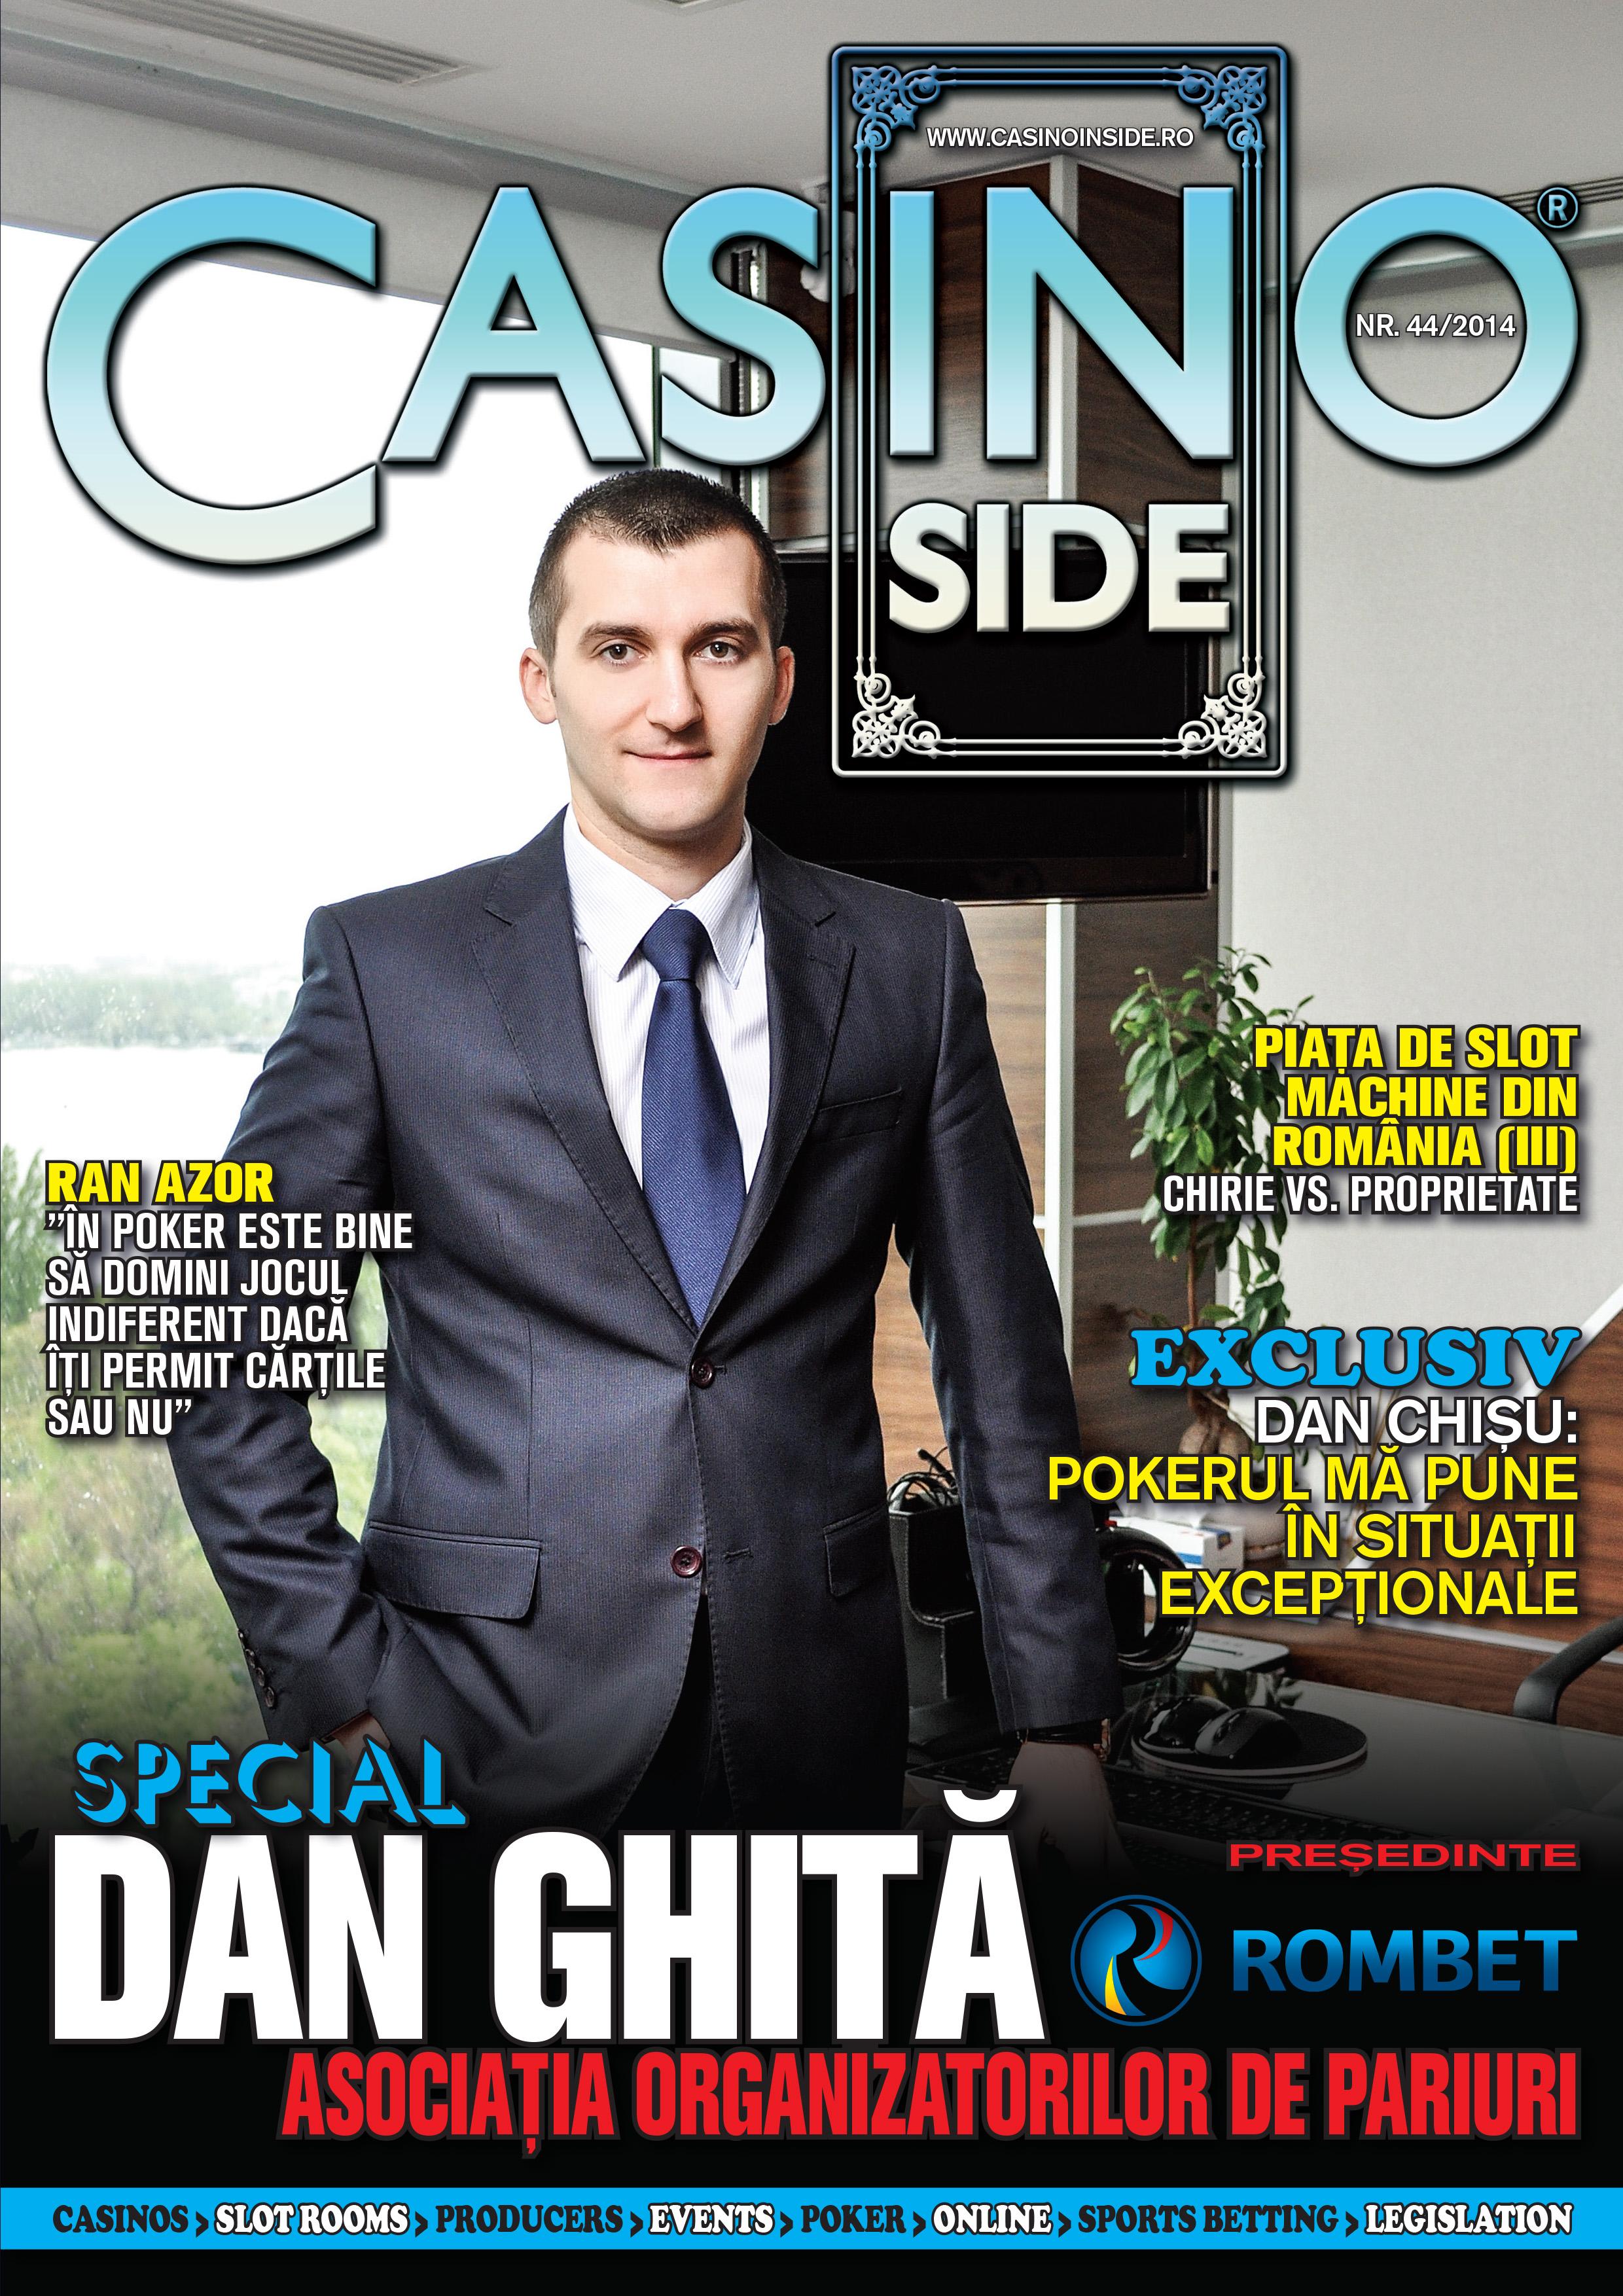 Inside edge gambling magazine